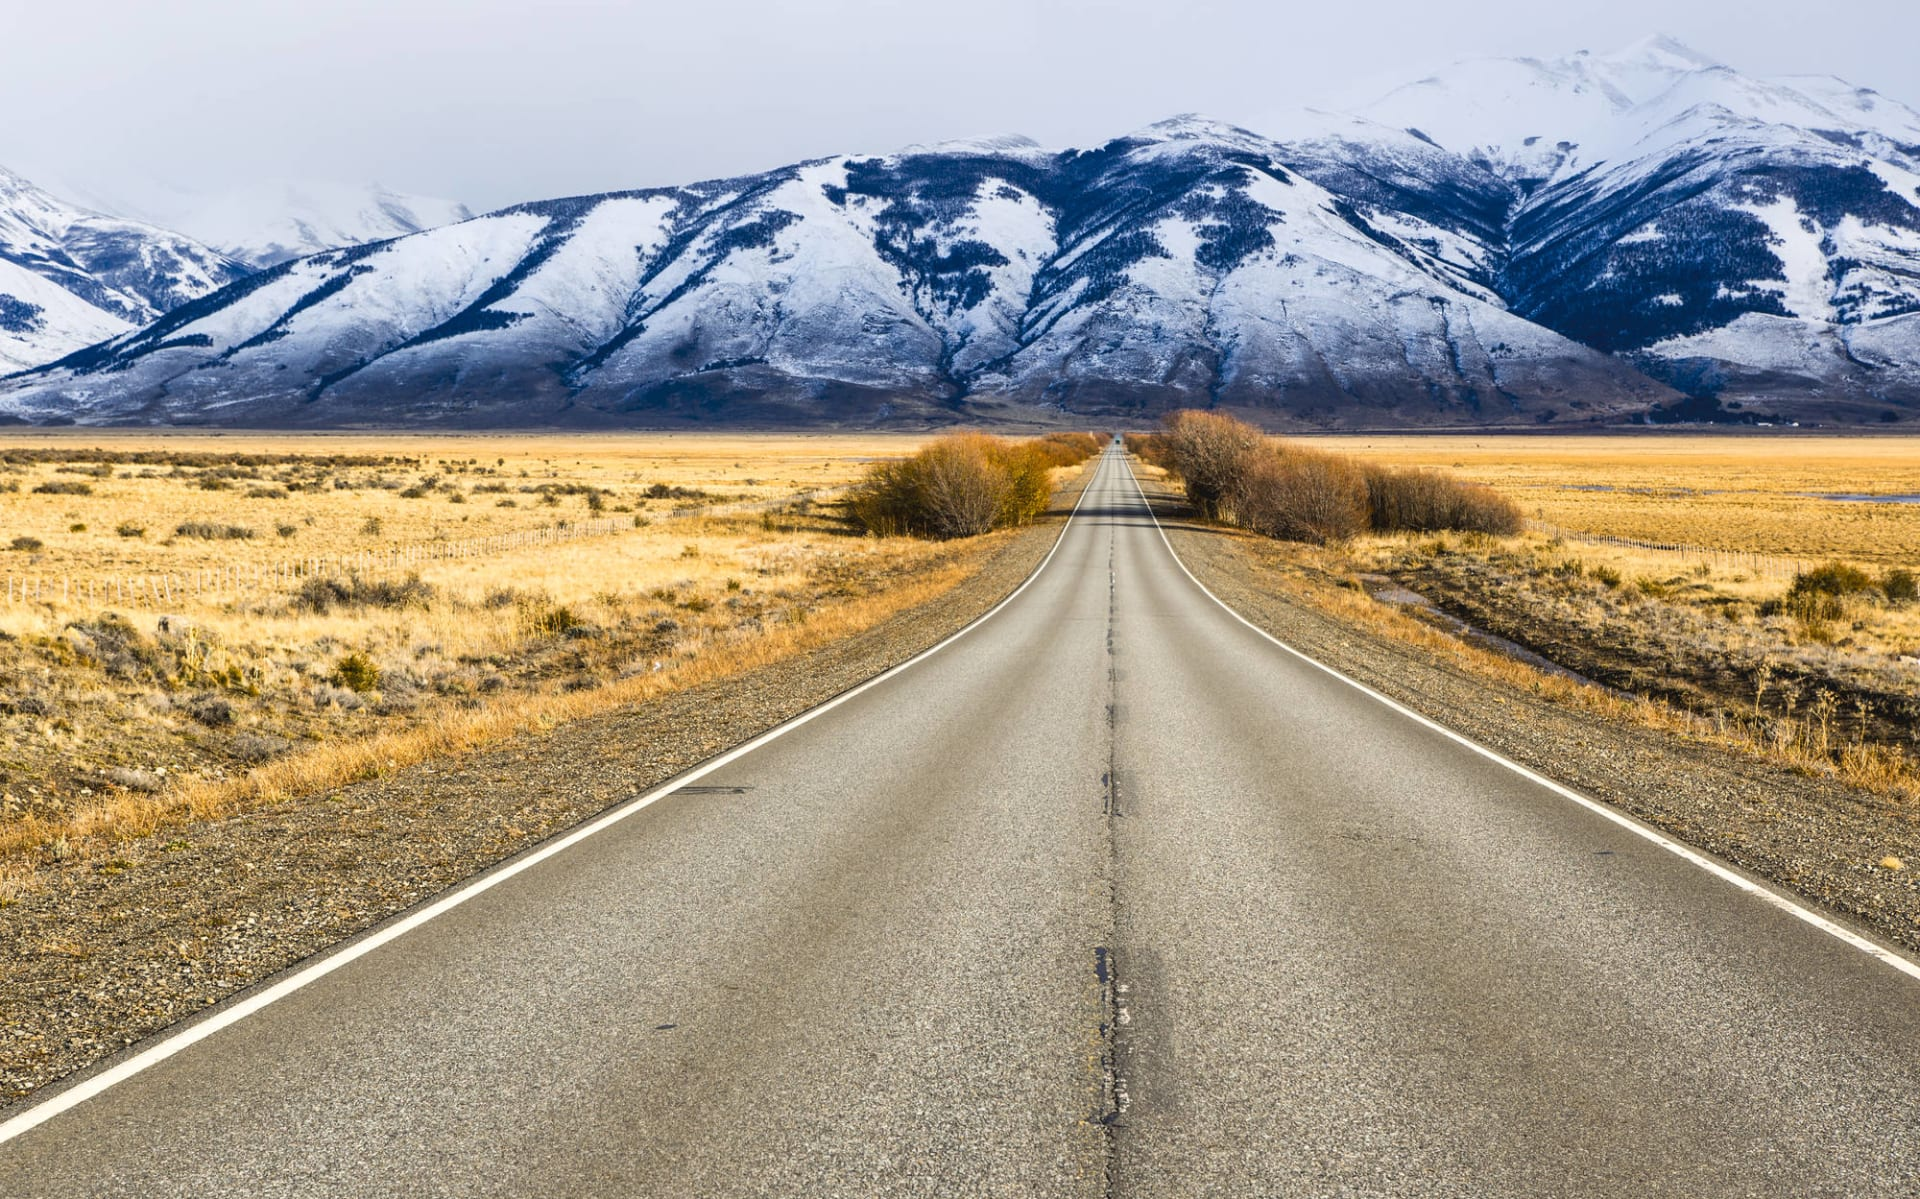 Ruta 40: Trelew - El Calafate: Argentinien - El Calafate - Strasse